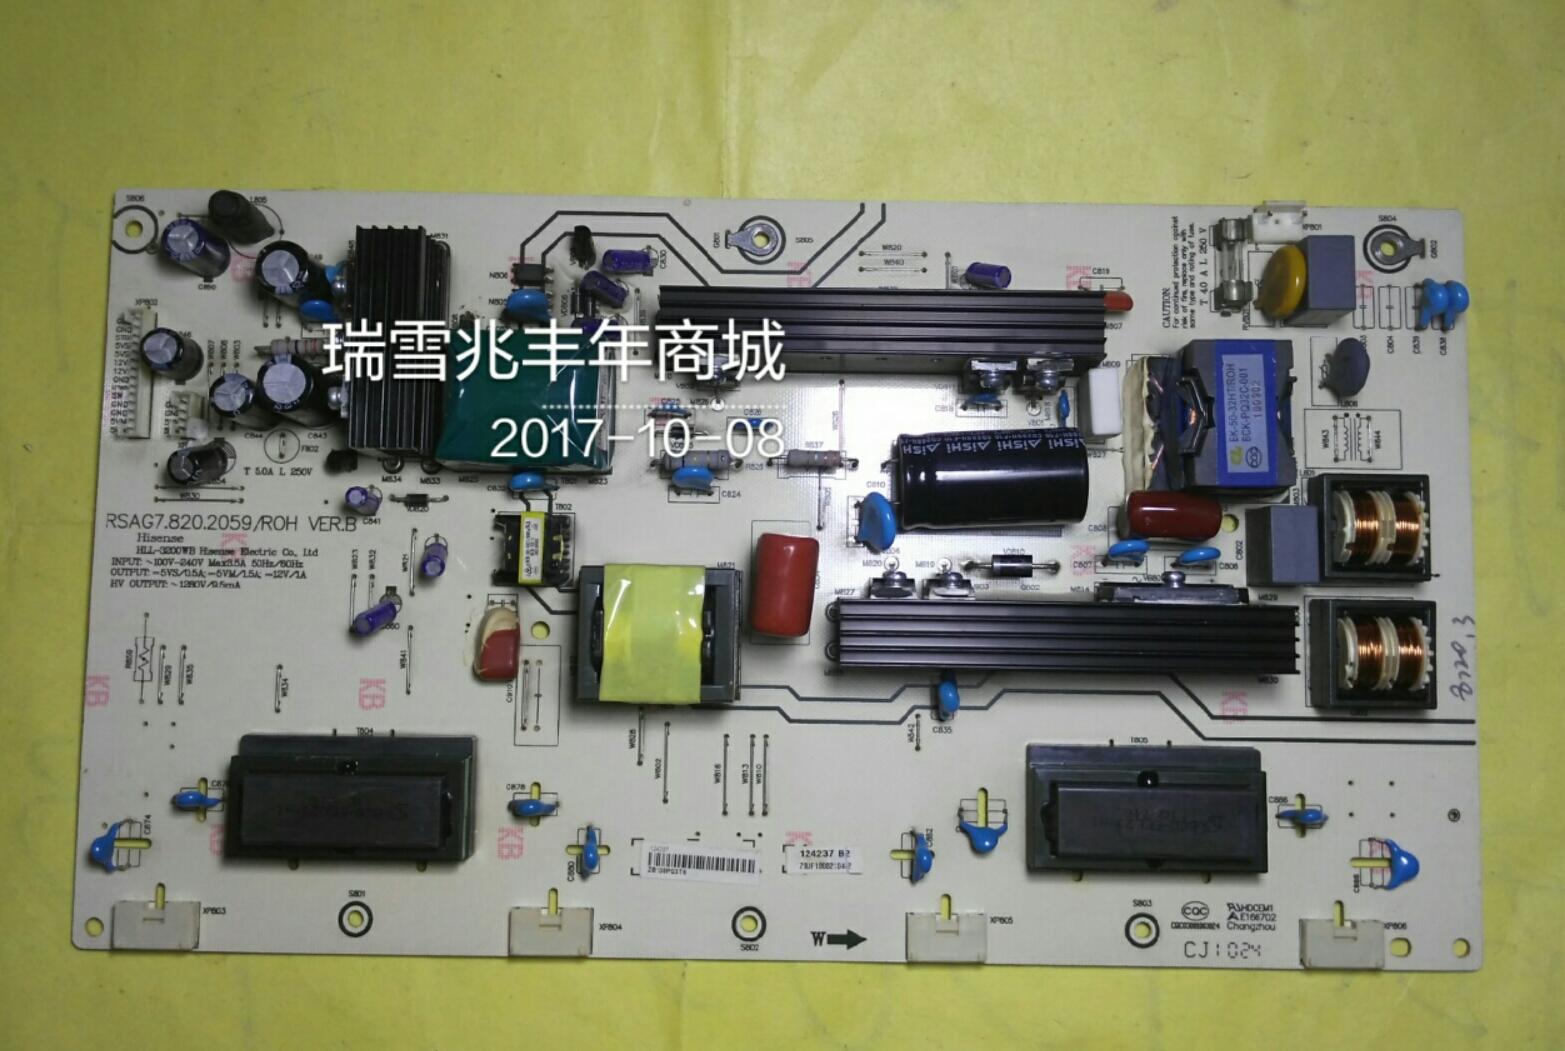 Original hisense TLM32V86KTLM32V88 RSAG7.820.2059/ROH LCD - TV macht.